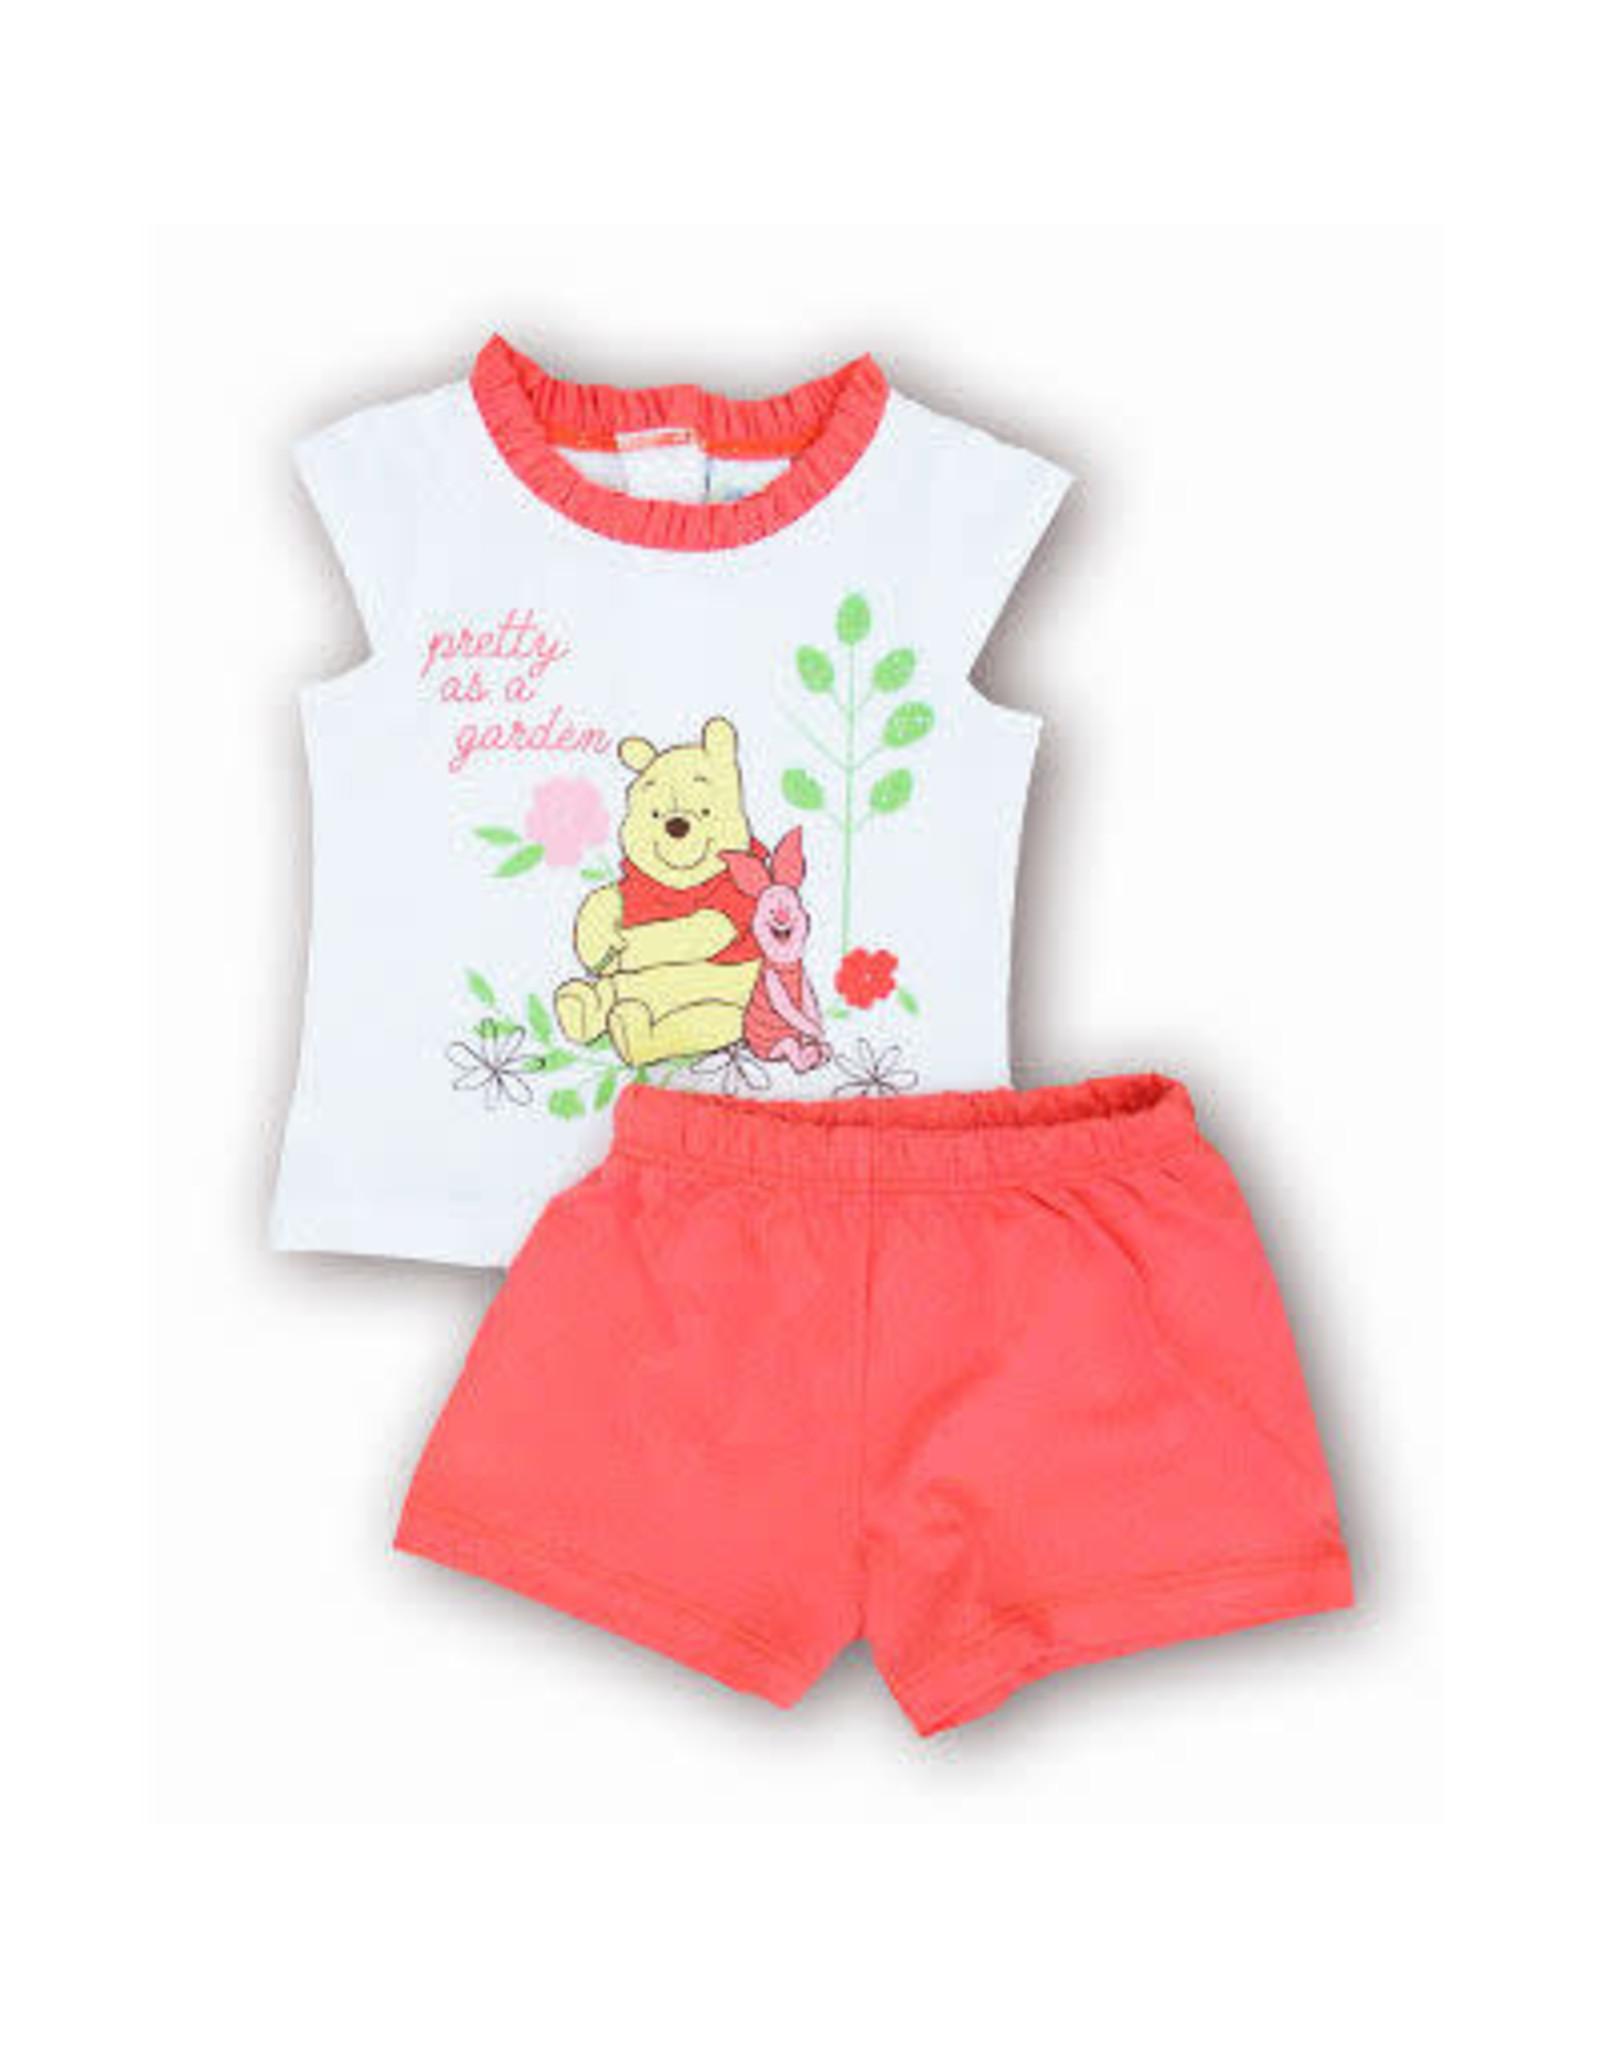 WINNIE THE POOH Baby Pyjamas - Pretty as a garden